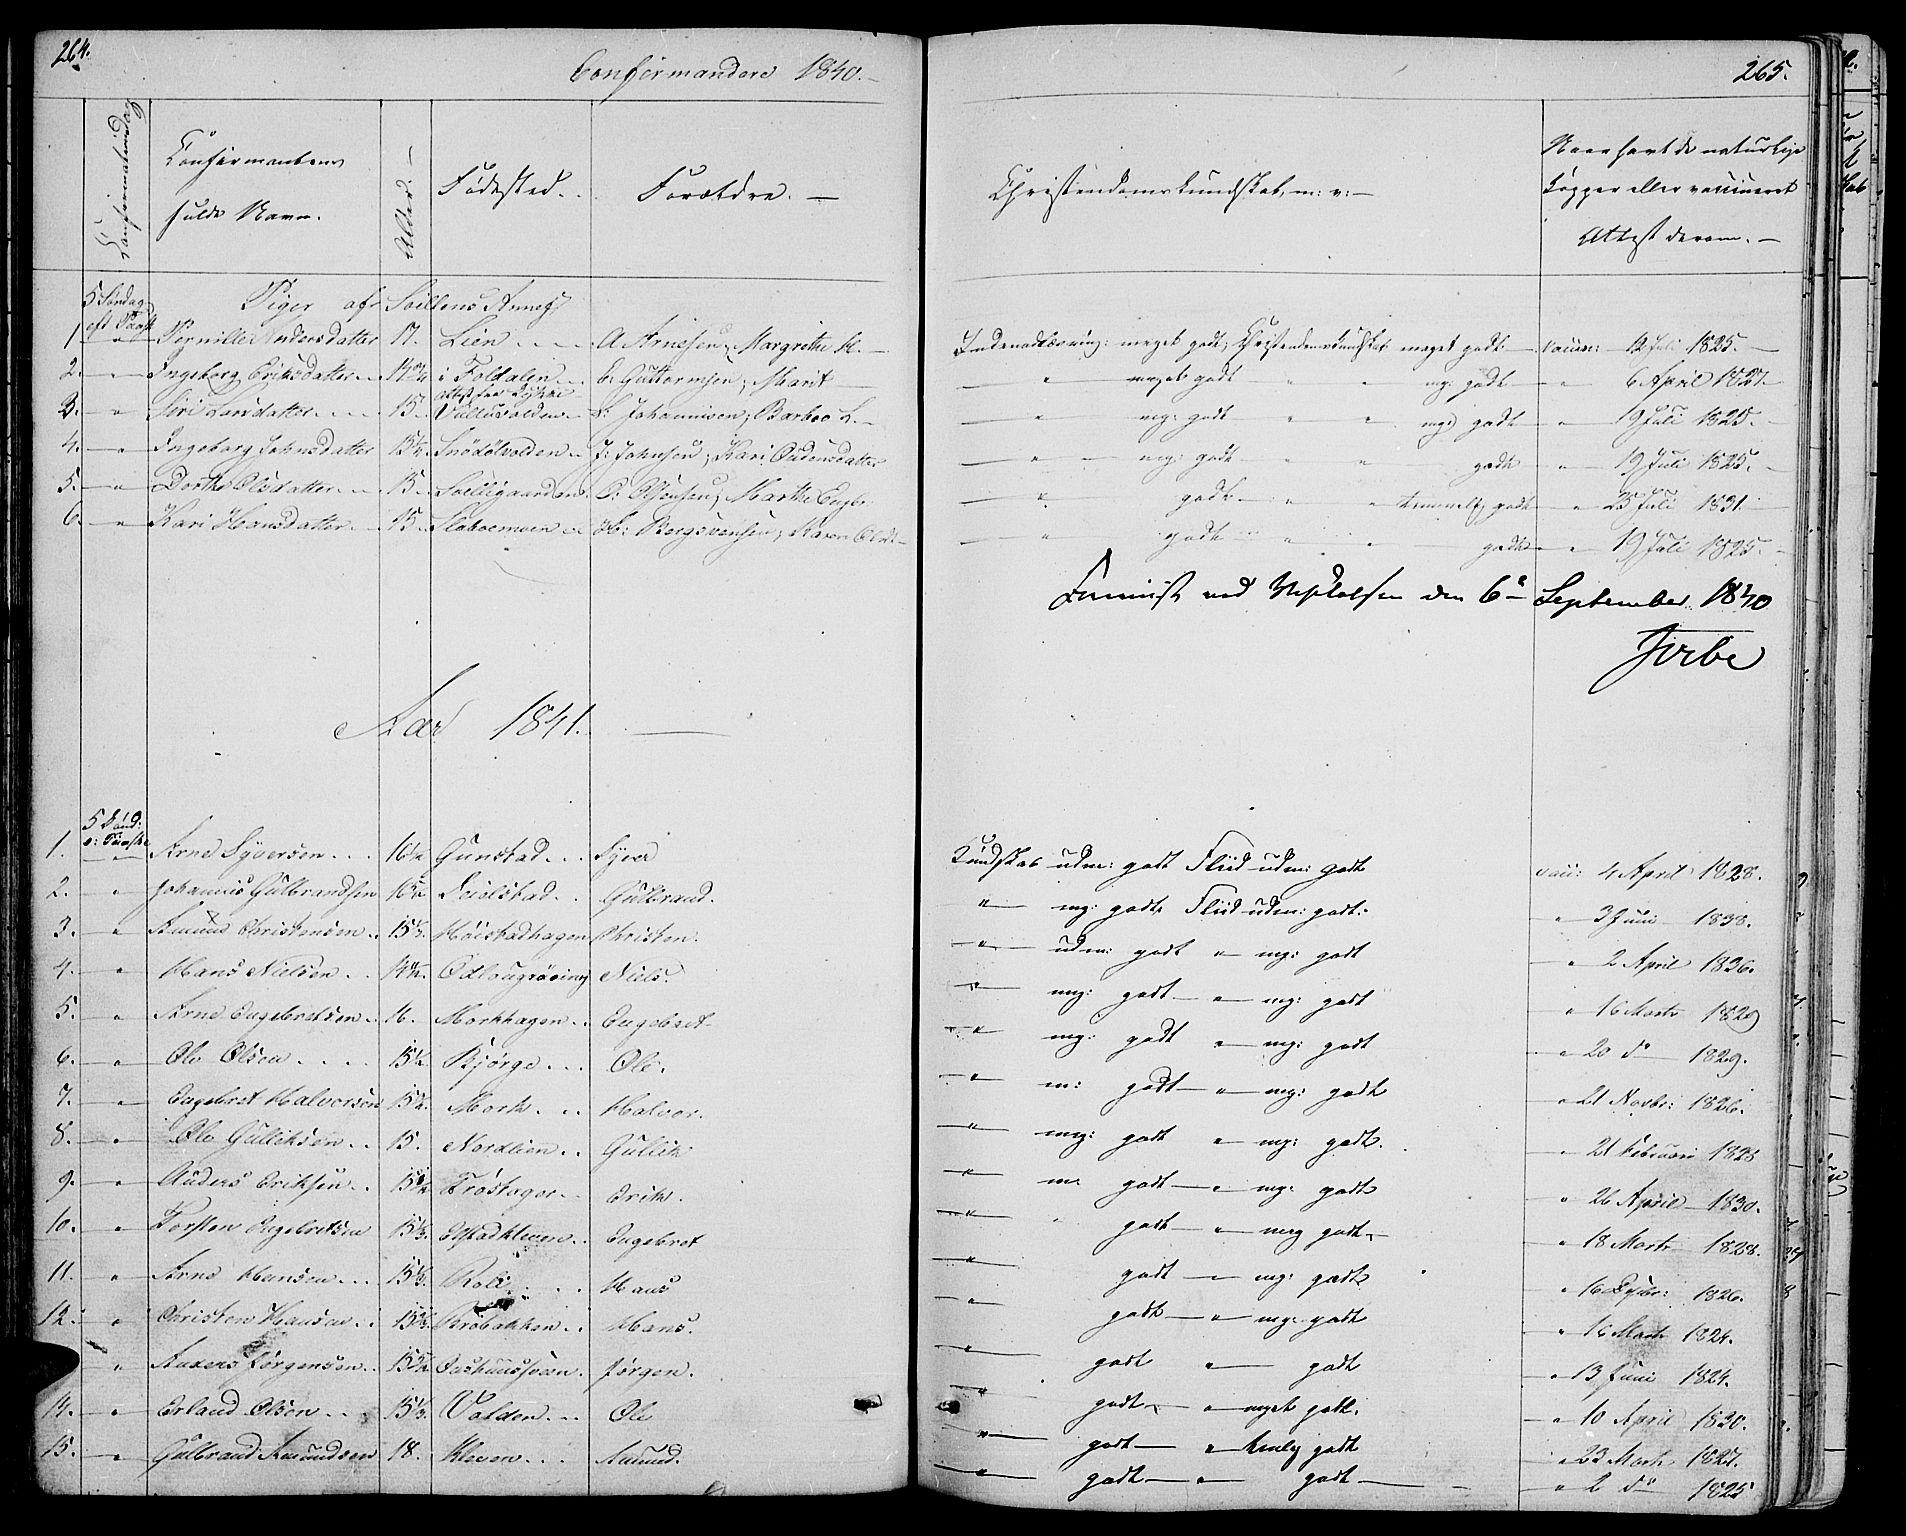 SAH, Ringebu prestekontor, Klokkerbok nr. 2, 1839-1853, s. 264-265